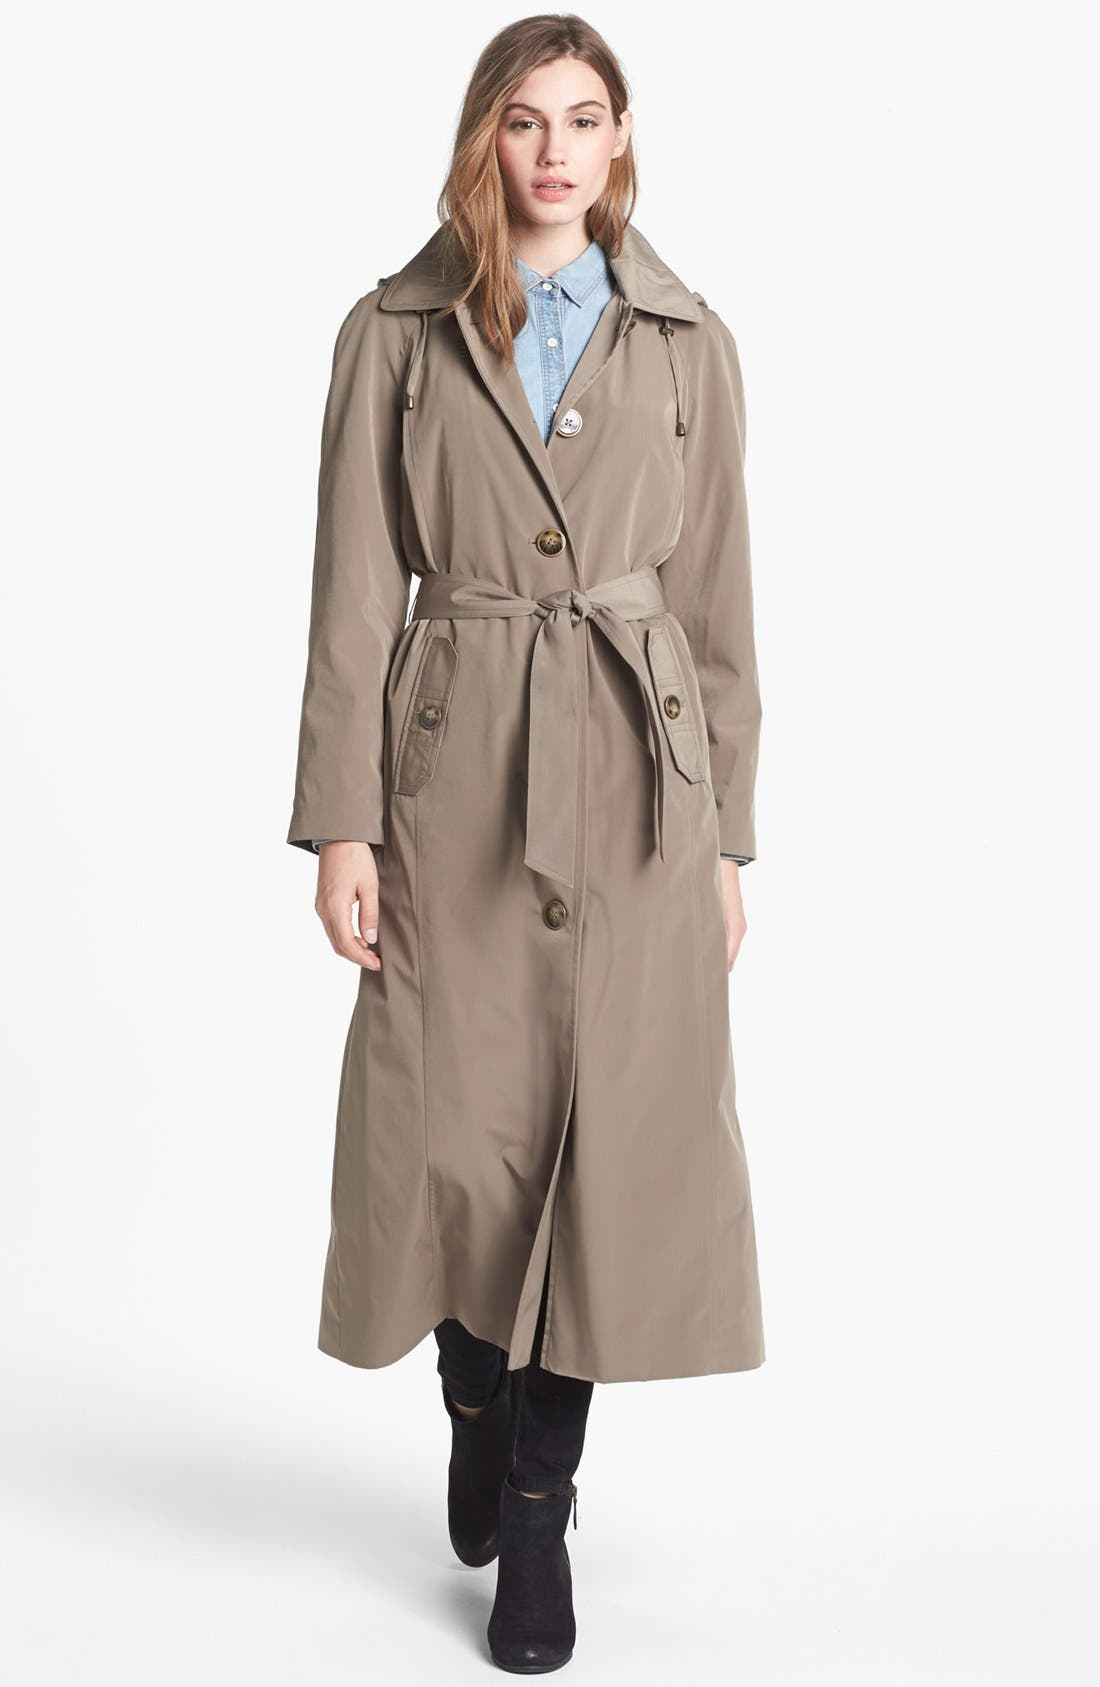 Main Image - London Fog Long Trench Coat with Detachable Hood & Liner (Regular & Petite)